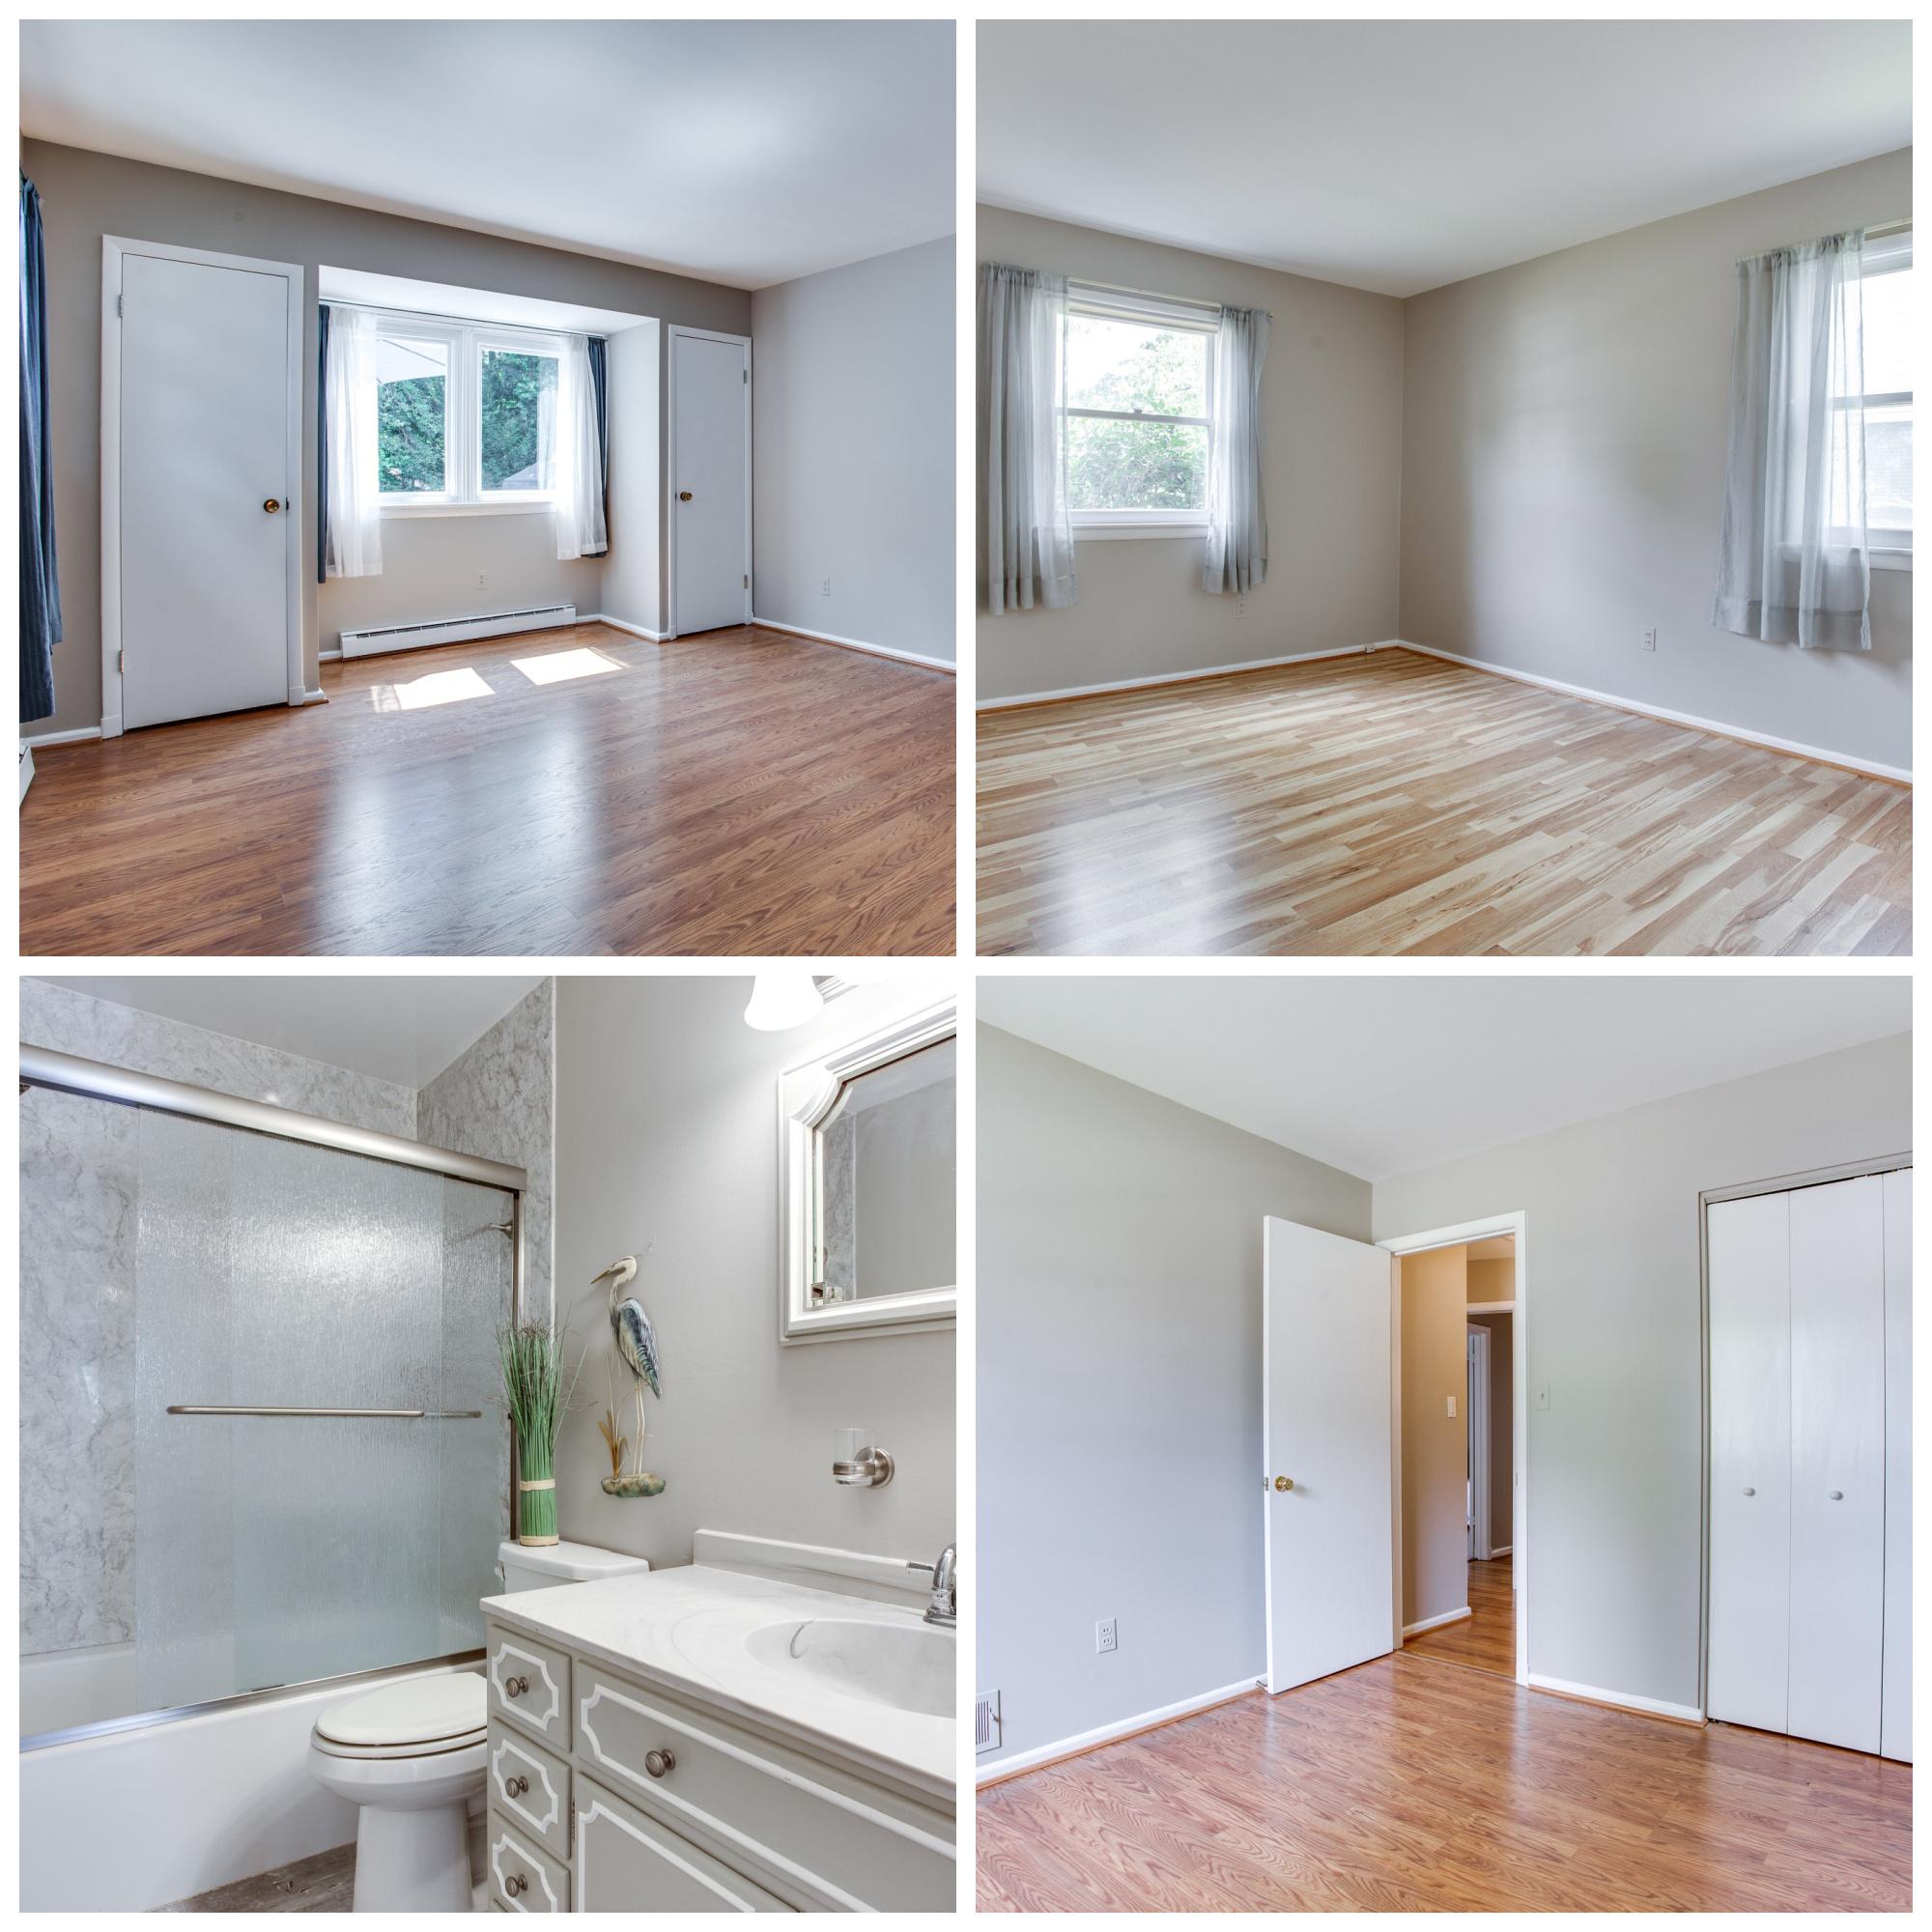 410 Yeonas Dr SW, Vienna- Bedrooms and Bathroom